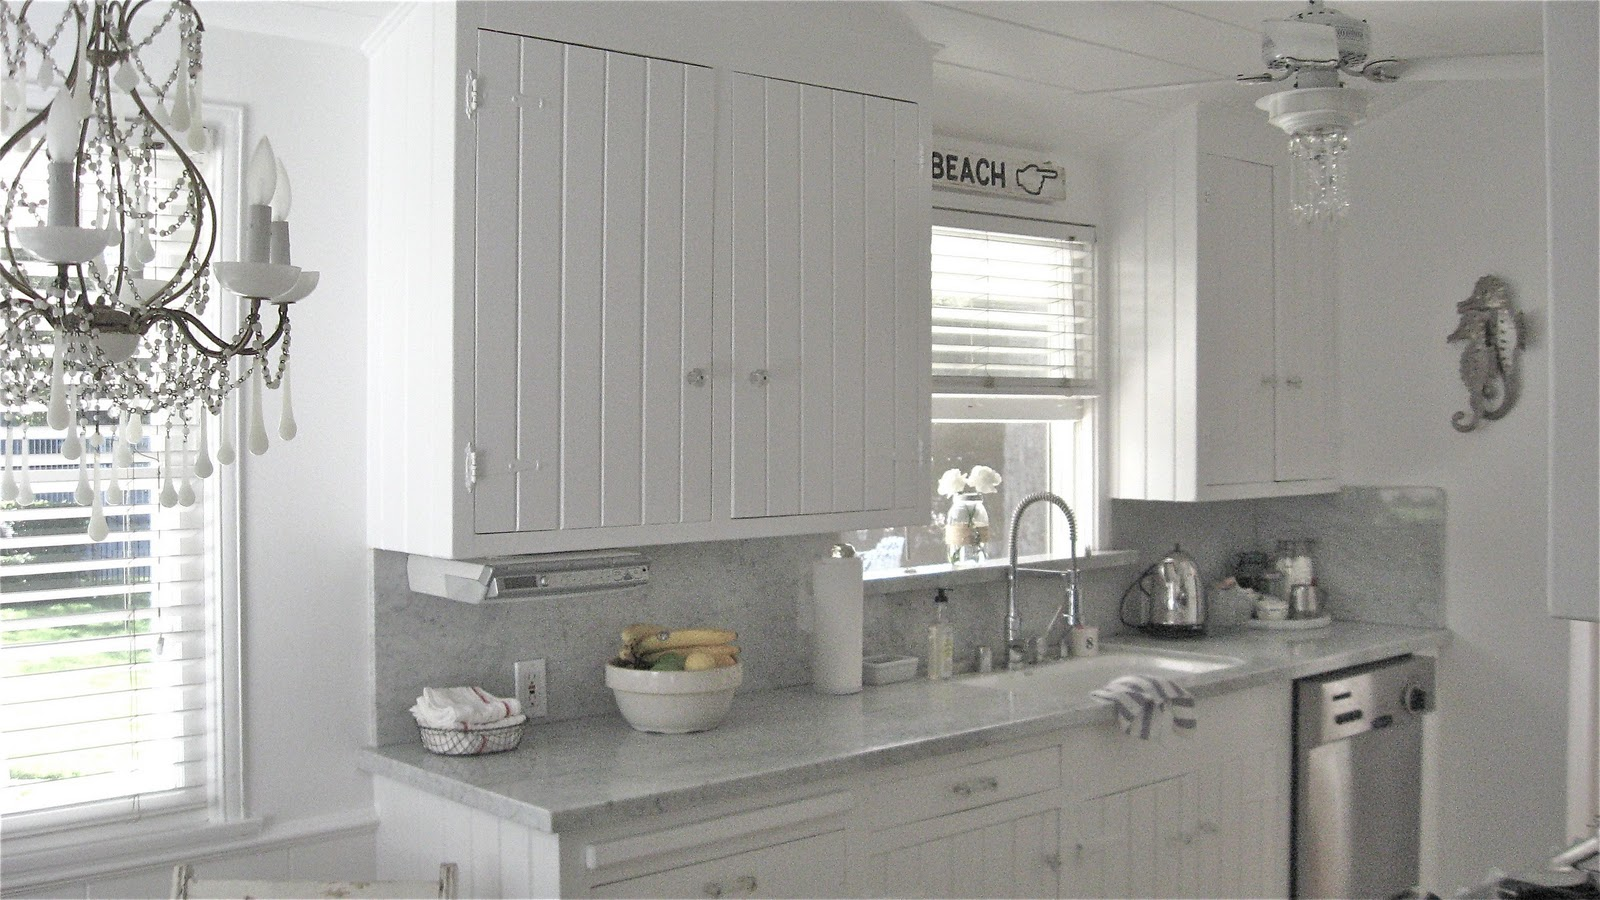 kitchen cabinet ideas beach house photo - 1